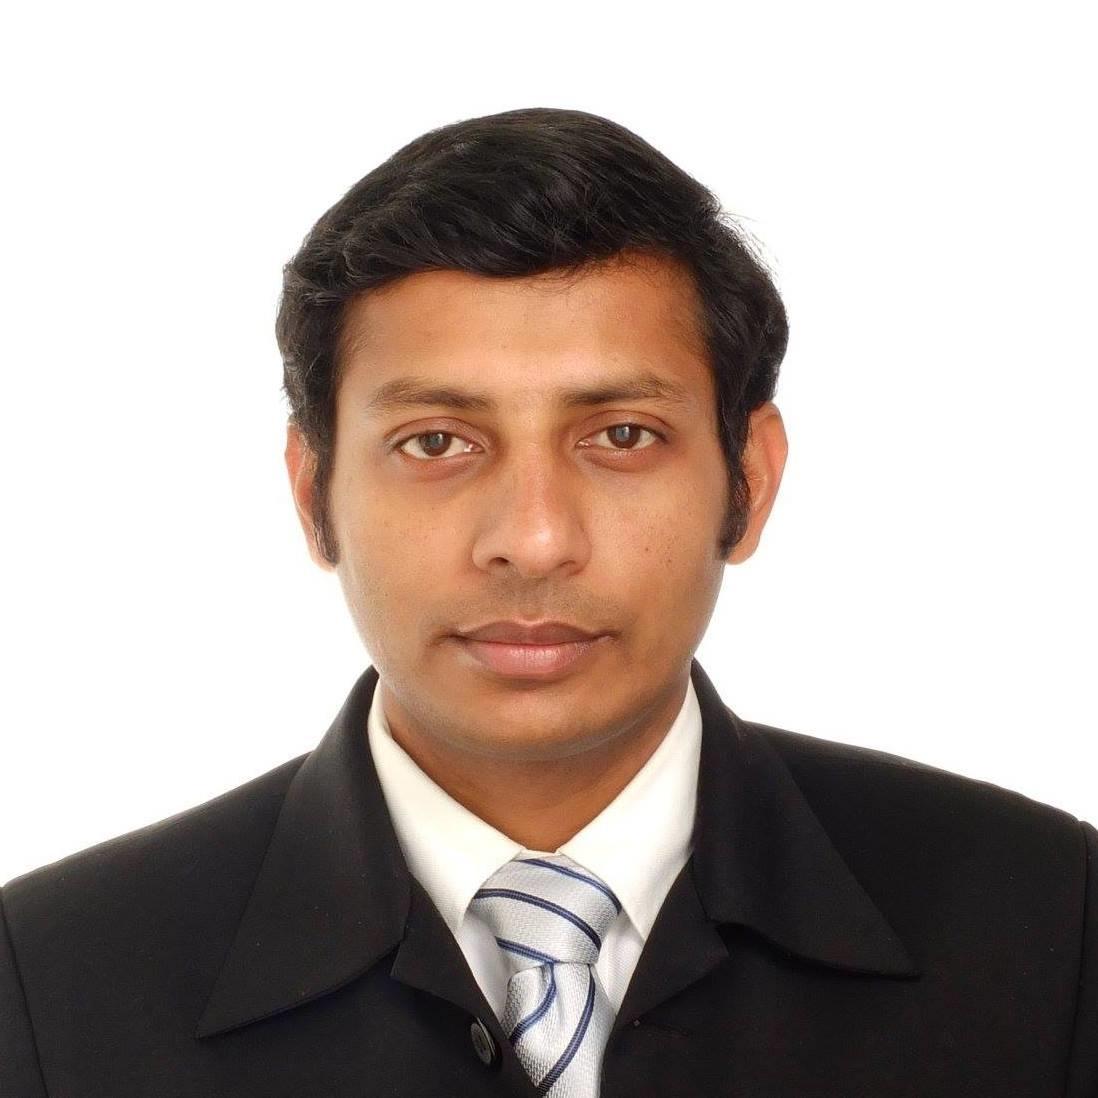 Portrait of Emran Ali